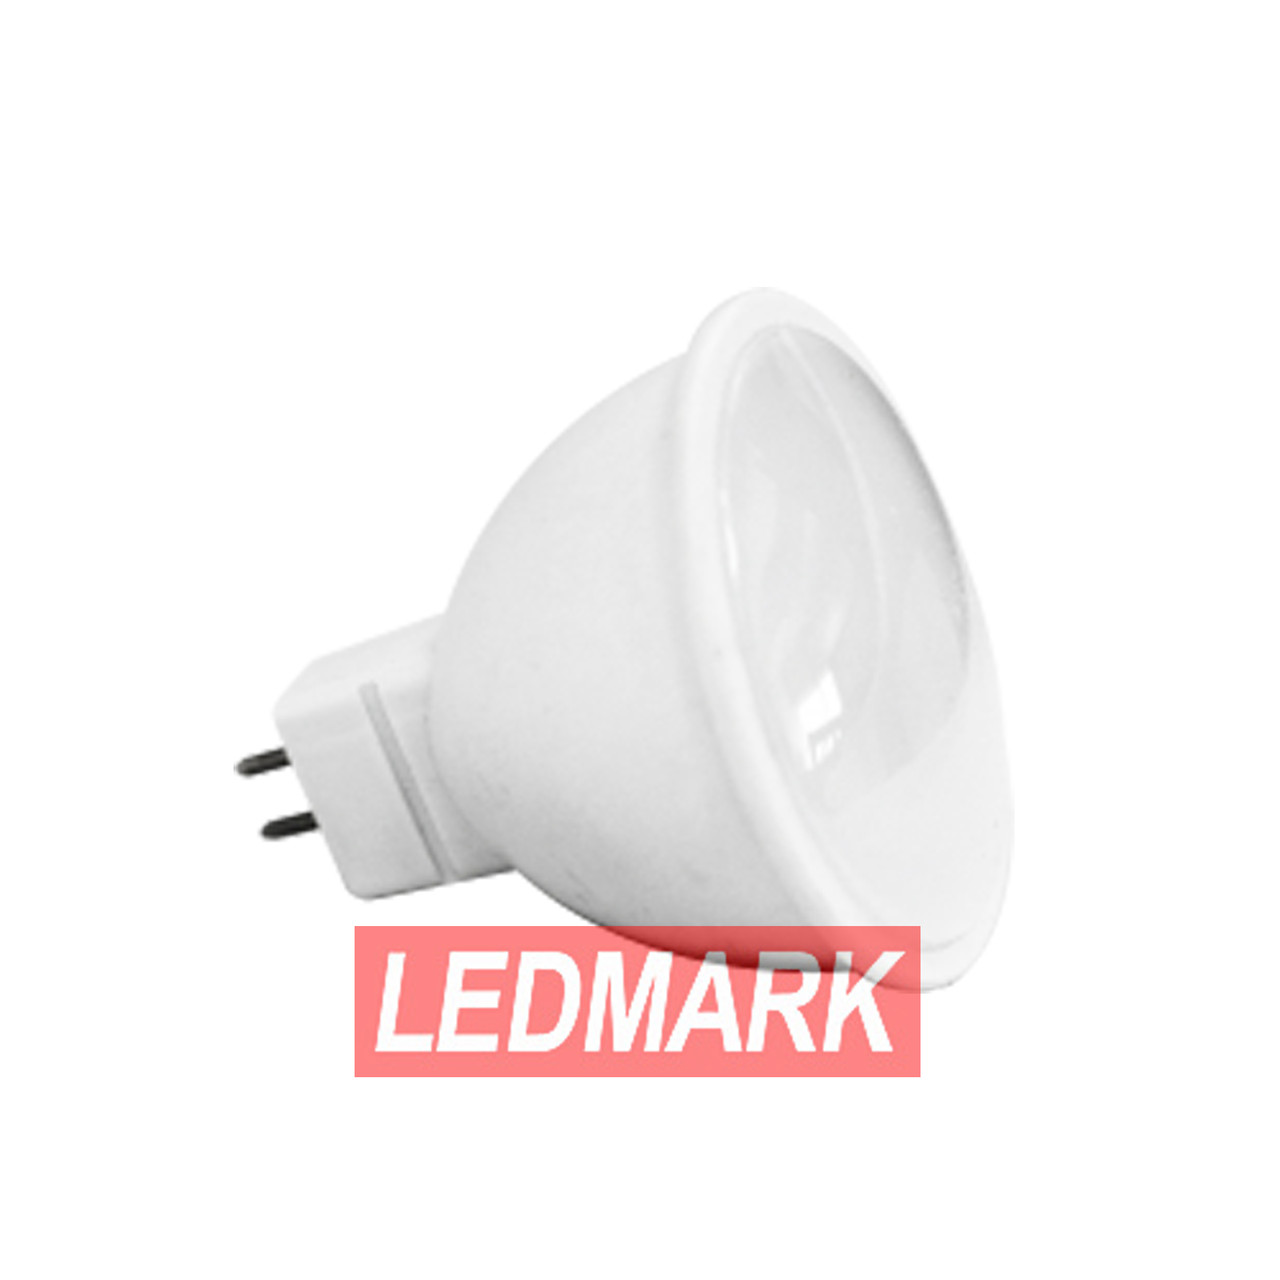 Лампа светодиодная BIOM BG-202 5W 4500K GU5,3